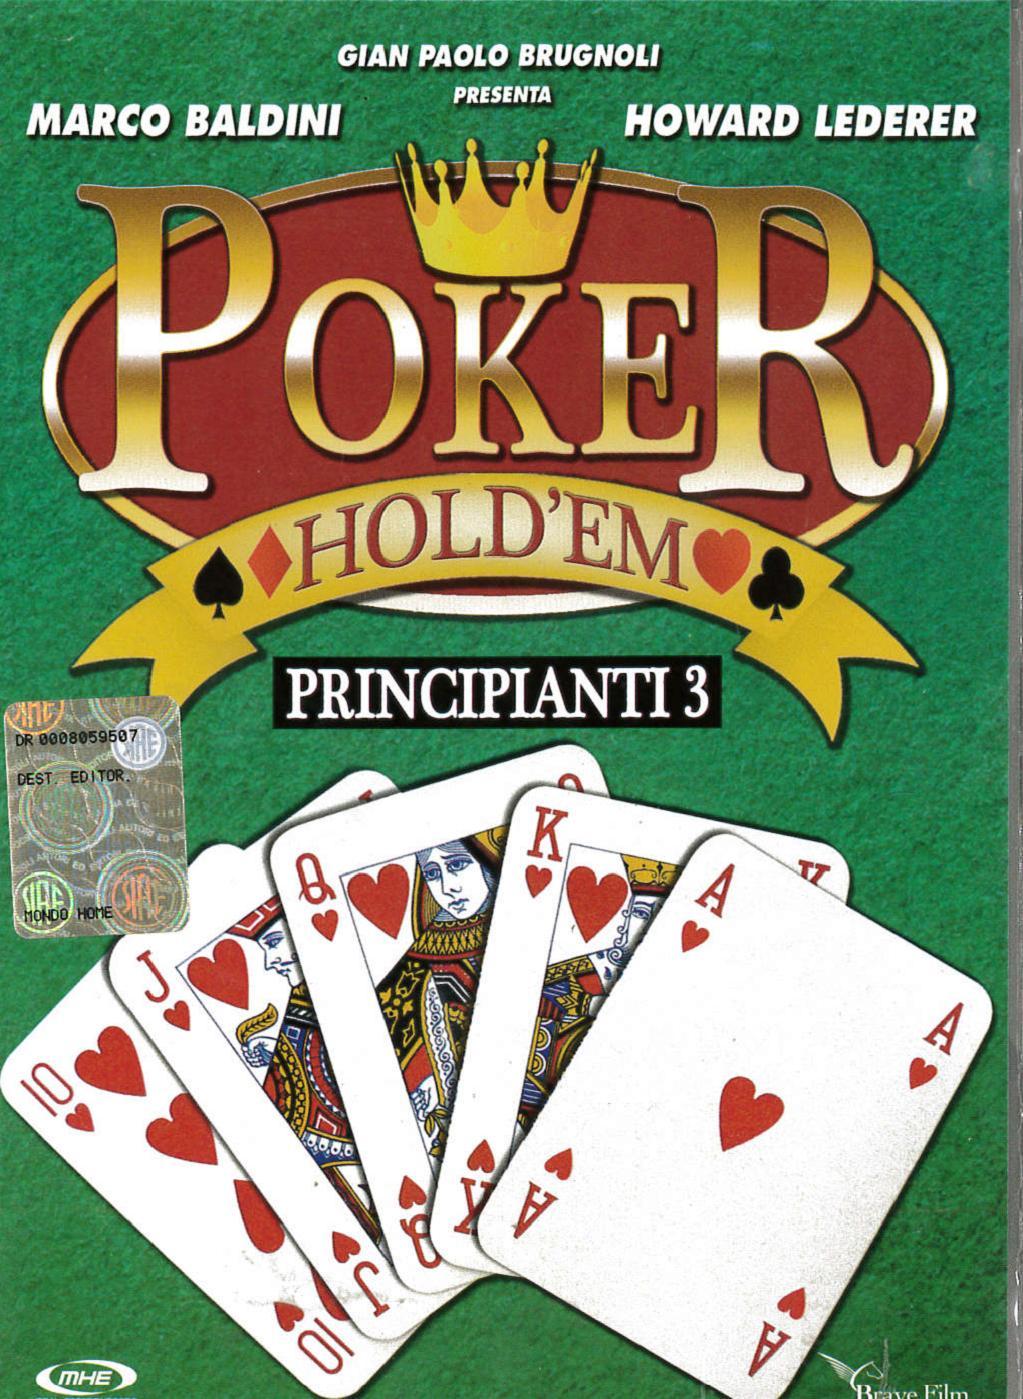 POKER HOLD'EM PRINCIPIANTI 3 (DVD)